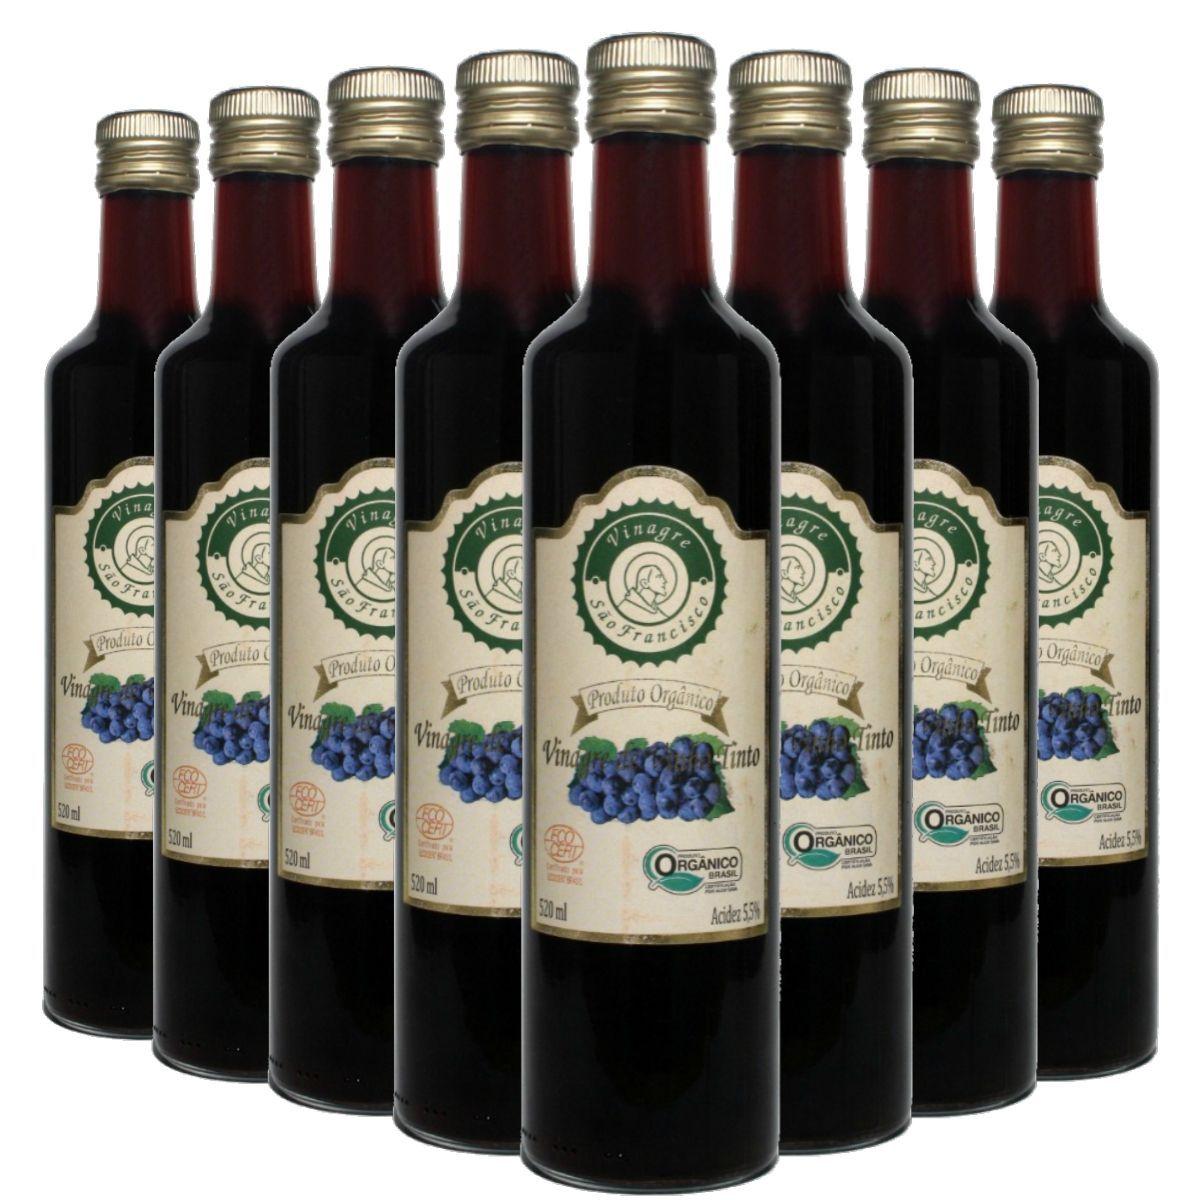 Kit 8 Vinagre Orgânico São Francisco Vinho Tinto Acidez 5,5% - 500ml